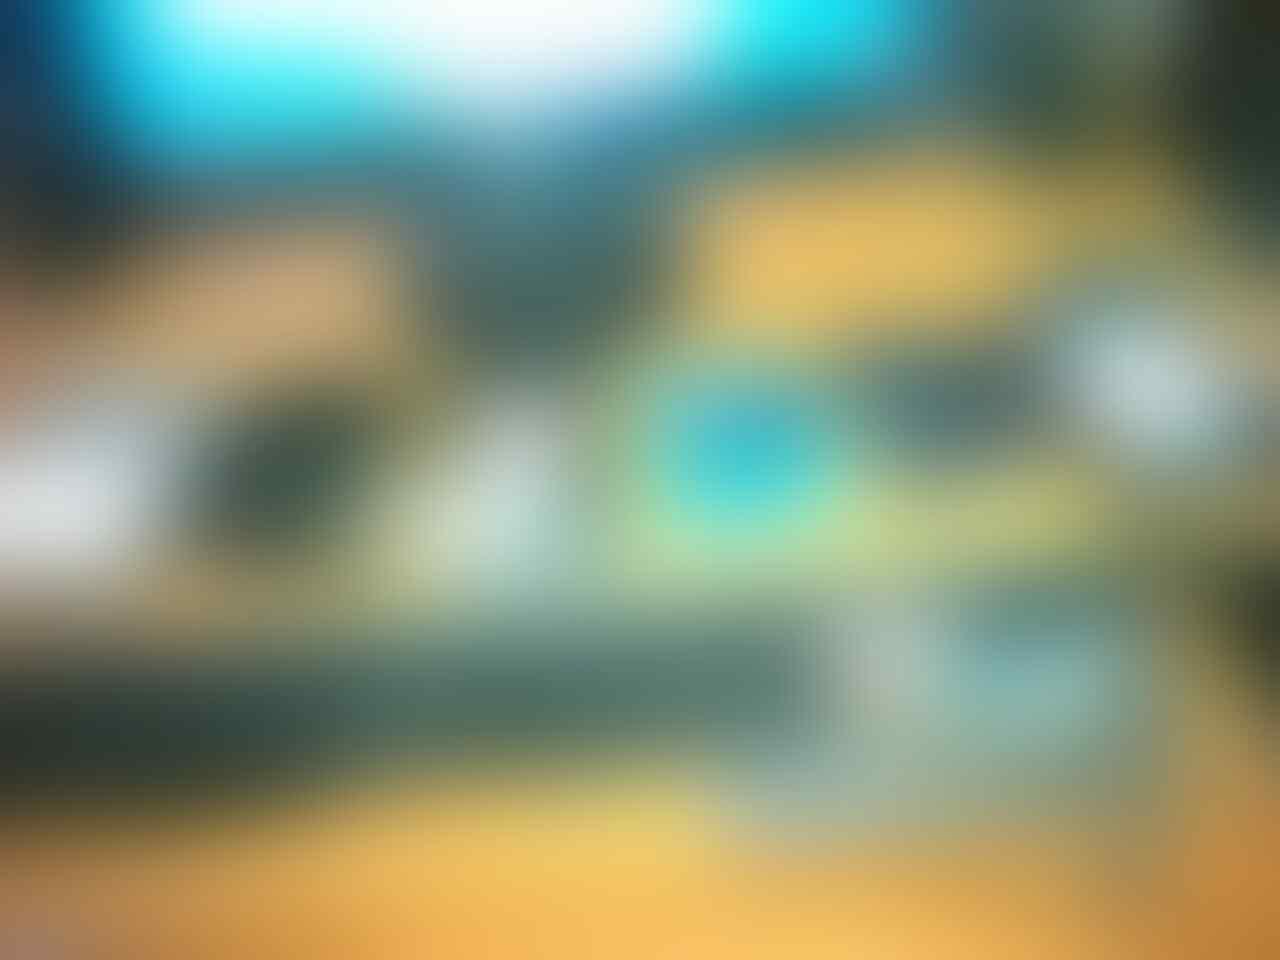 JASA RAKIT dan INSTAL ULANG OS PC NOTEBOOK KOMPUTER SIAP JABODETABEK